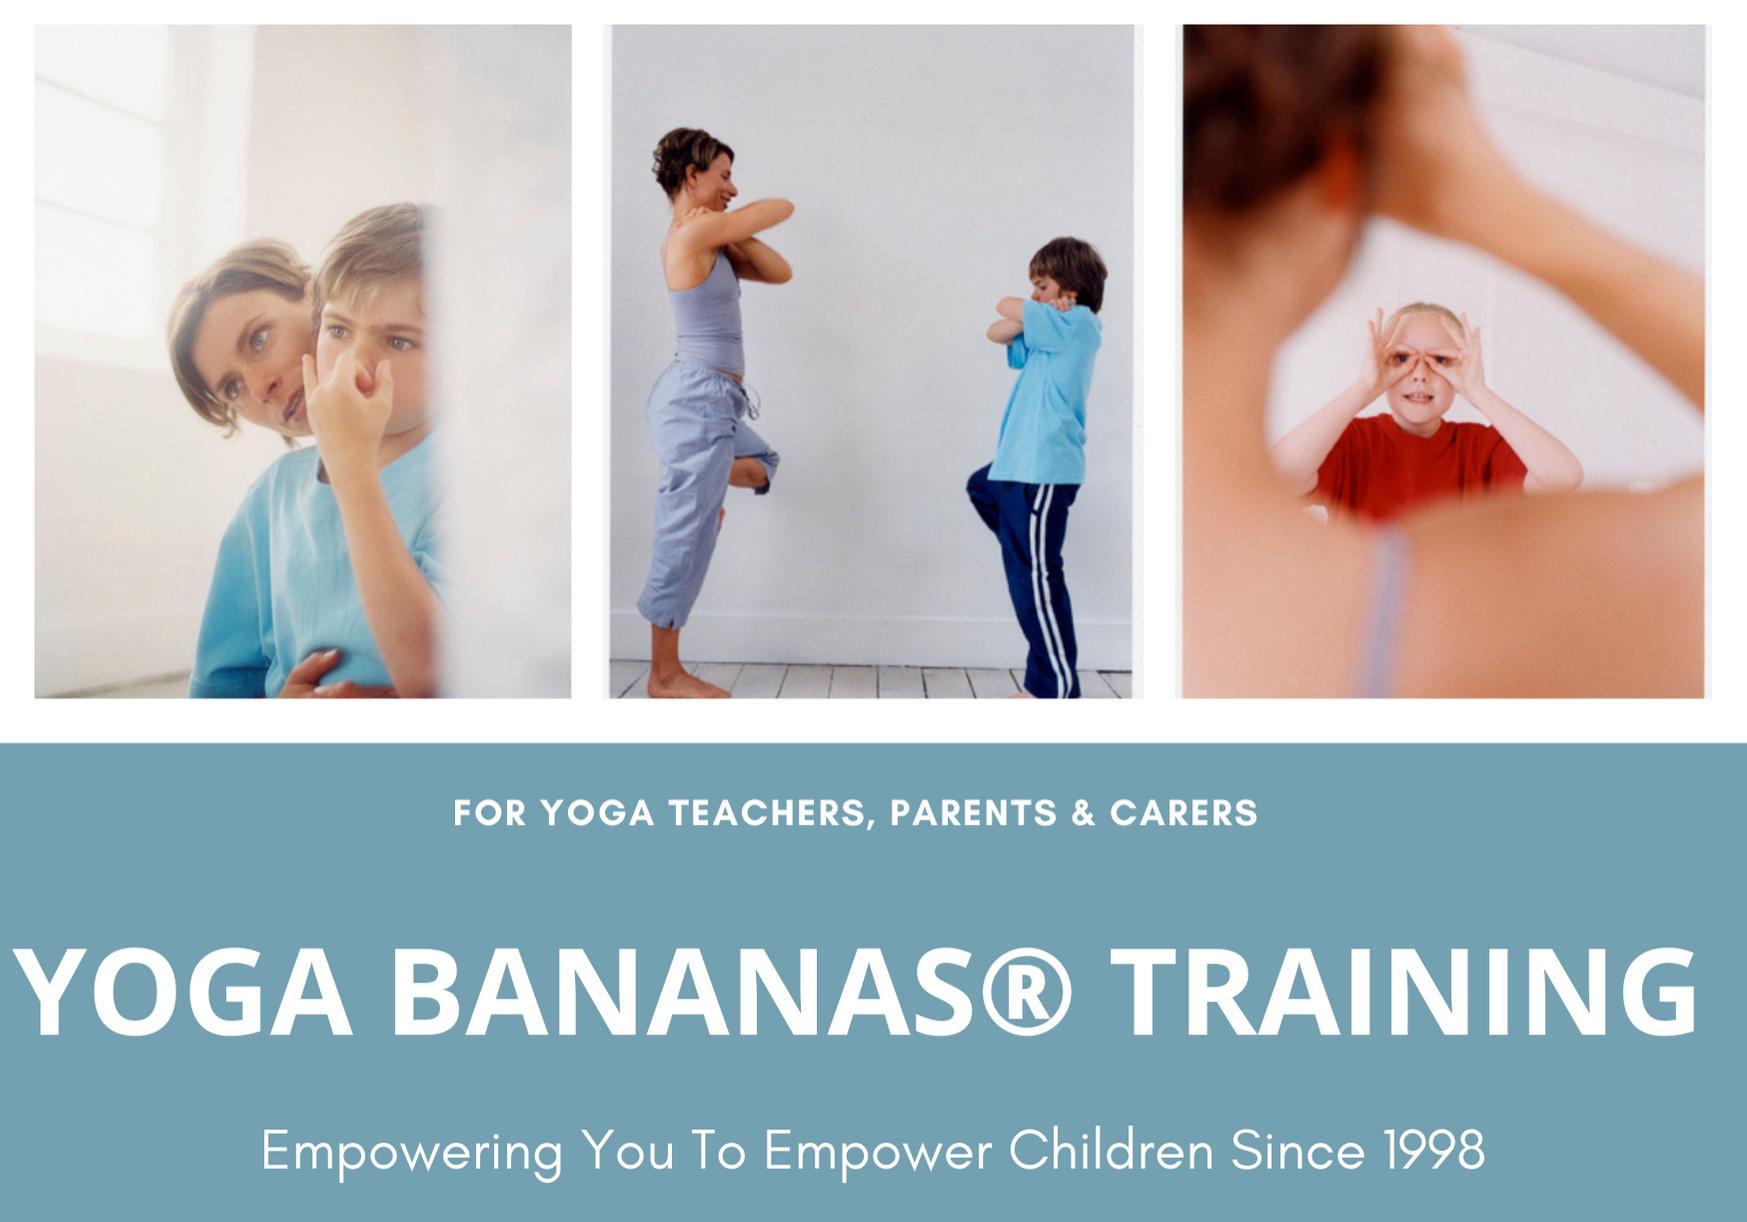 Yoga-Bananas-Training-2.png